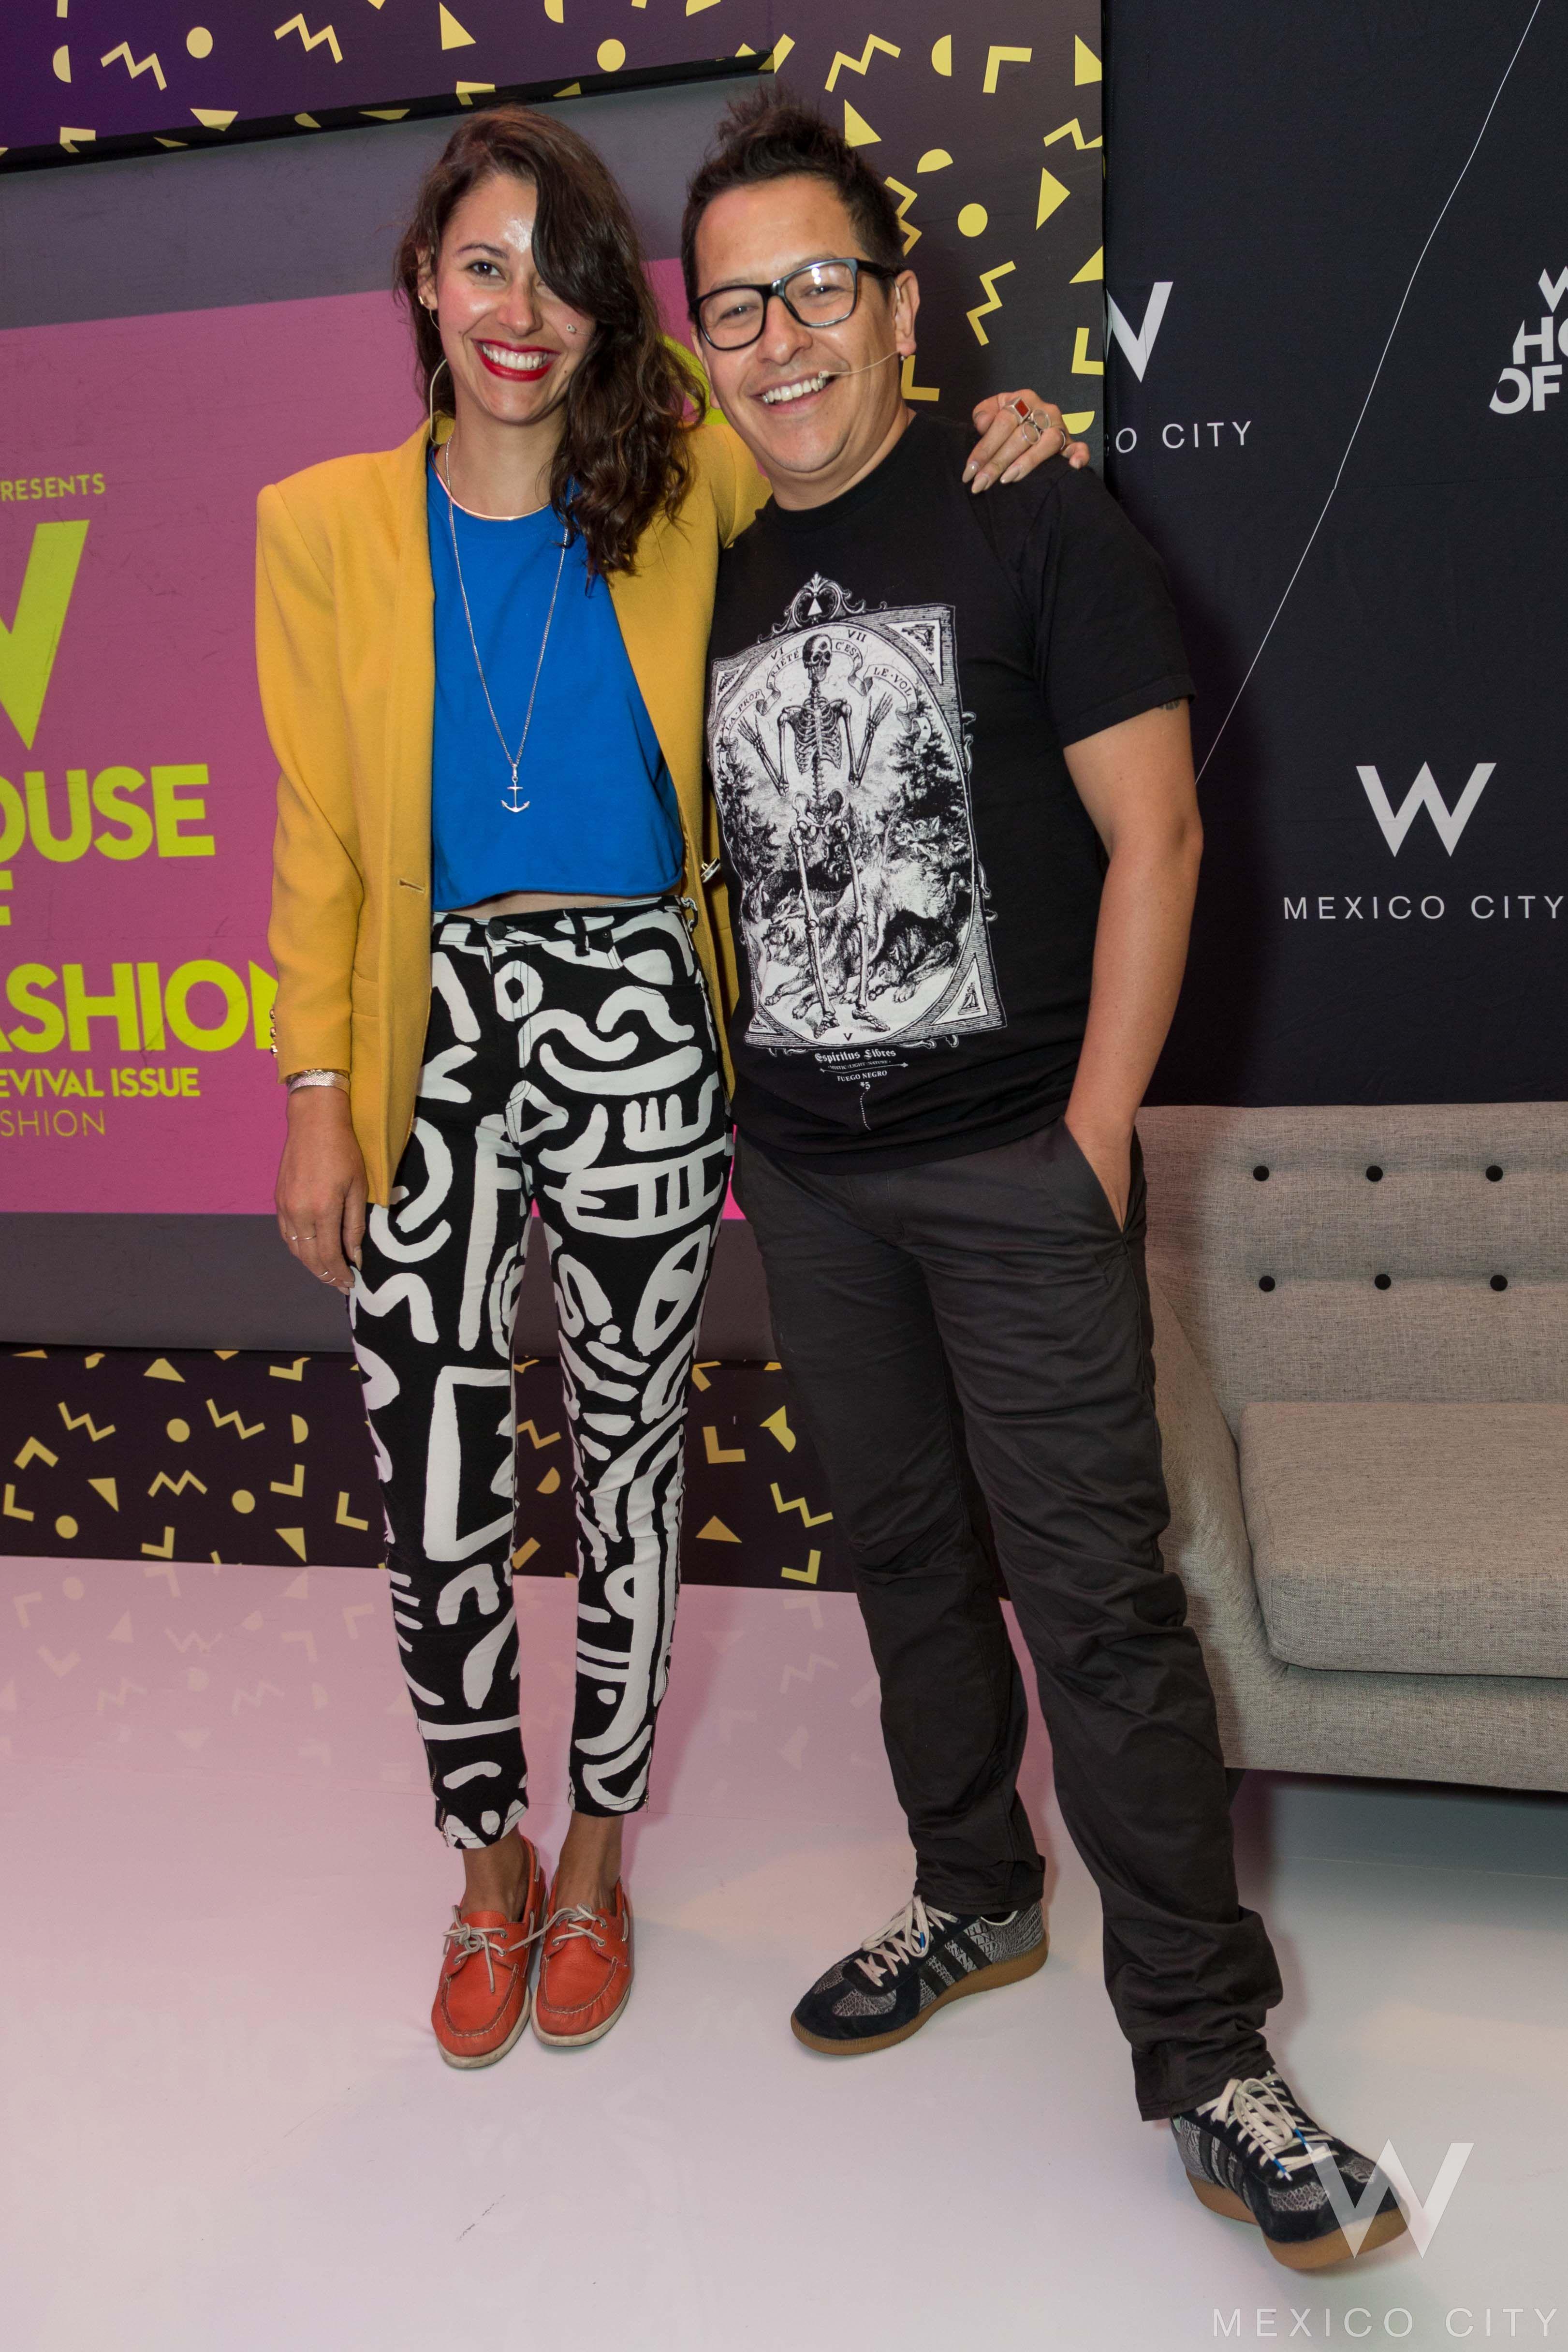 Sesión de Behance Review con Nayeli de Alba y David Franco en W House Of Fashion: The Revival Issue.  http://winsidermexico.com/2015/03/7-w-house-of-fashion/ #WFASHION #WINSIDER